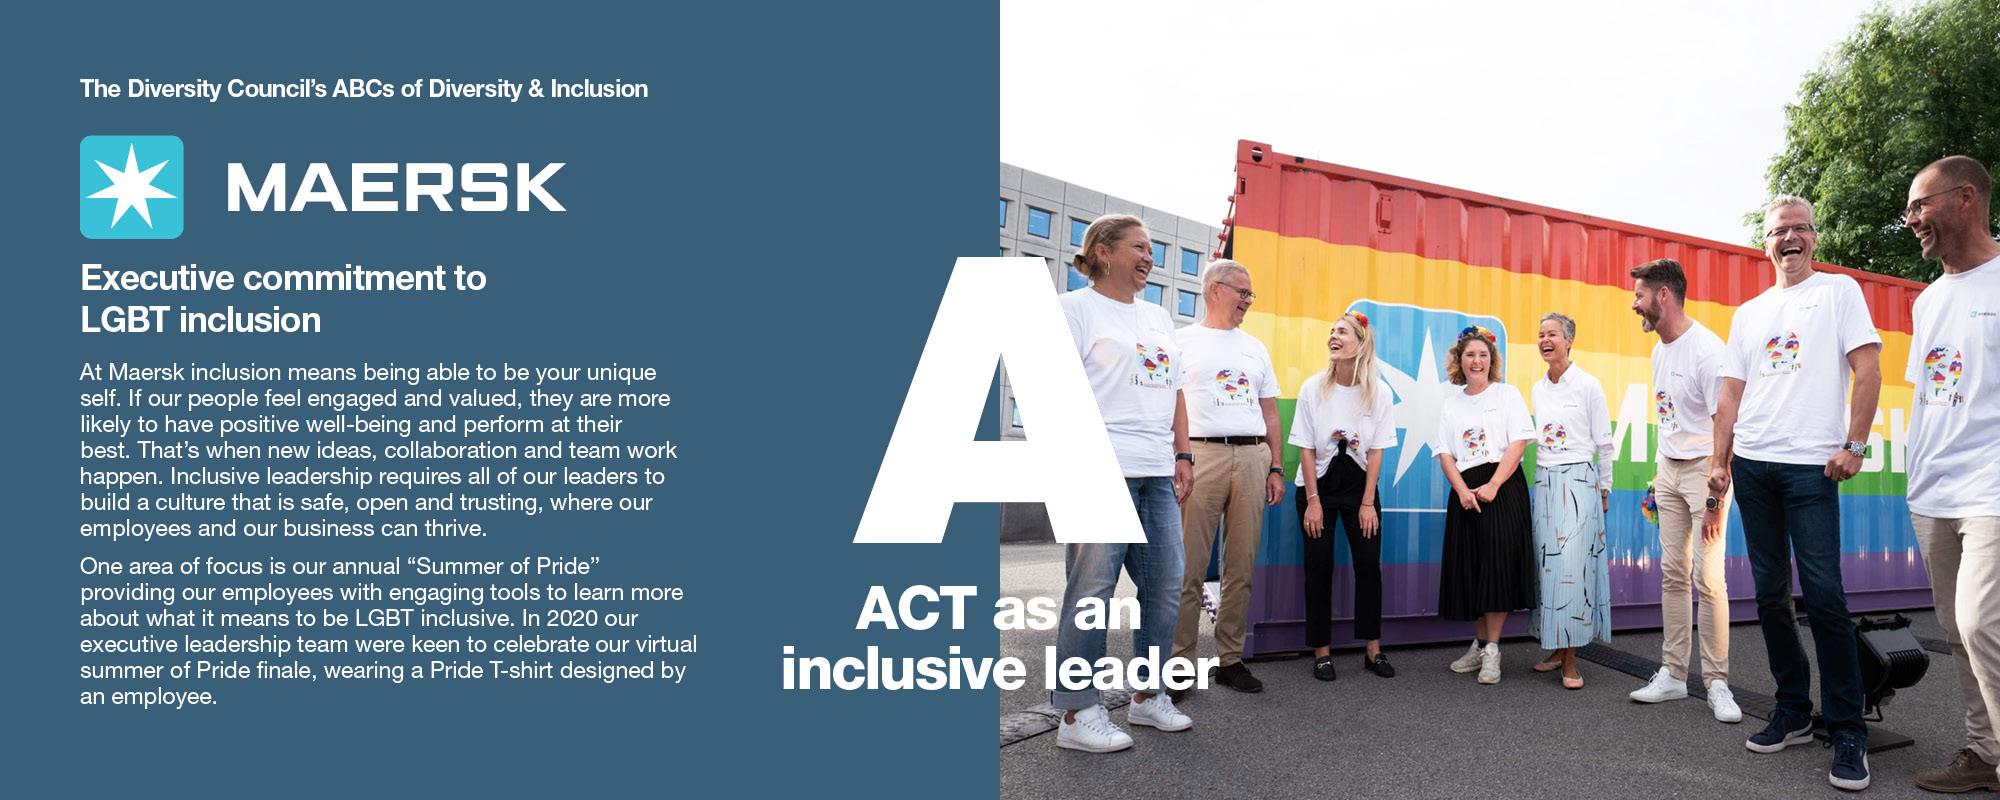 ABC slides5